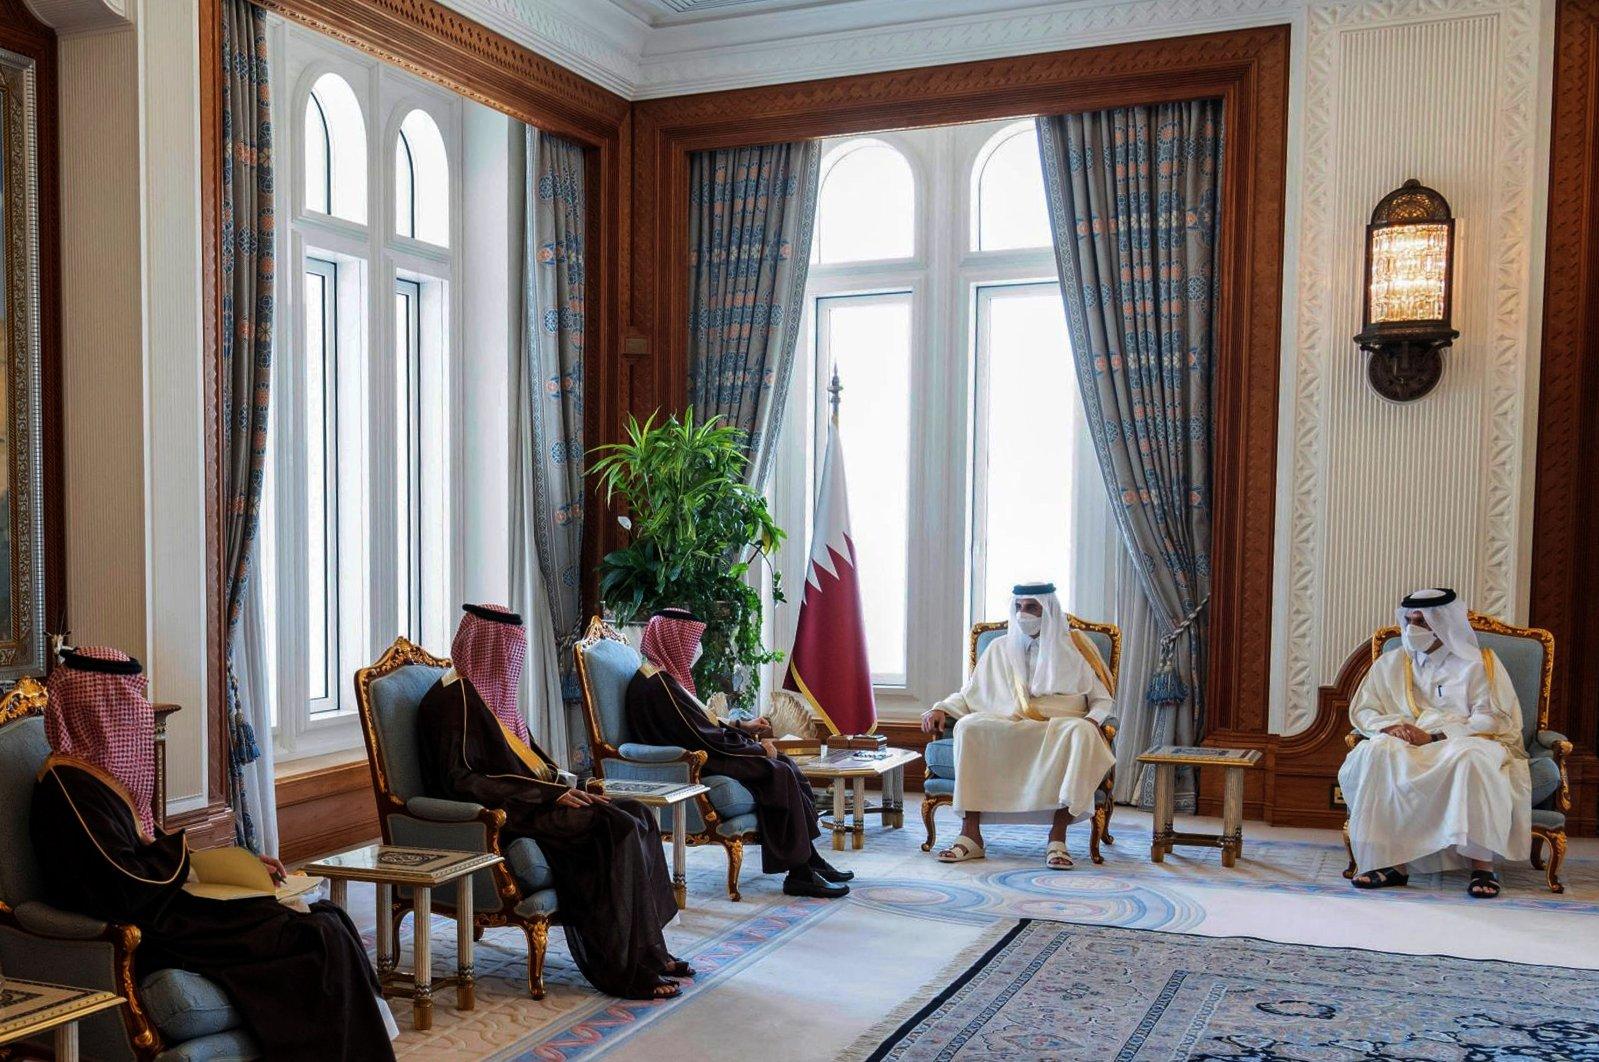 This handout picture released by the Qatar Amiri Diwan on March 8, 2021, shows the emir of Qatar, Sheikh Tamim bin Hamad Al Thani (2nd R), meeting with Saudi Arabia's Foreign Minister Prince Faisal bin Farhan Al Saud (3rd L) in the Qatari capital Doha. (AFP Photo)